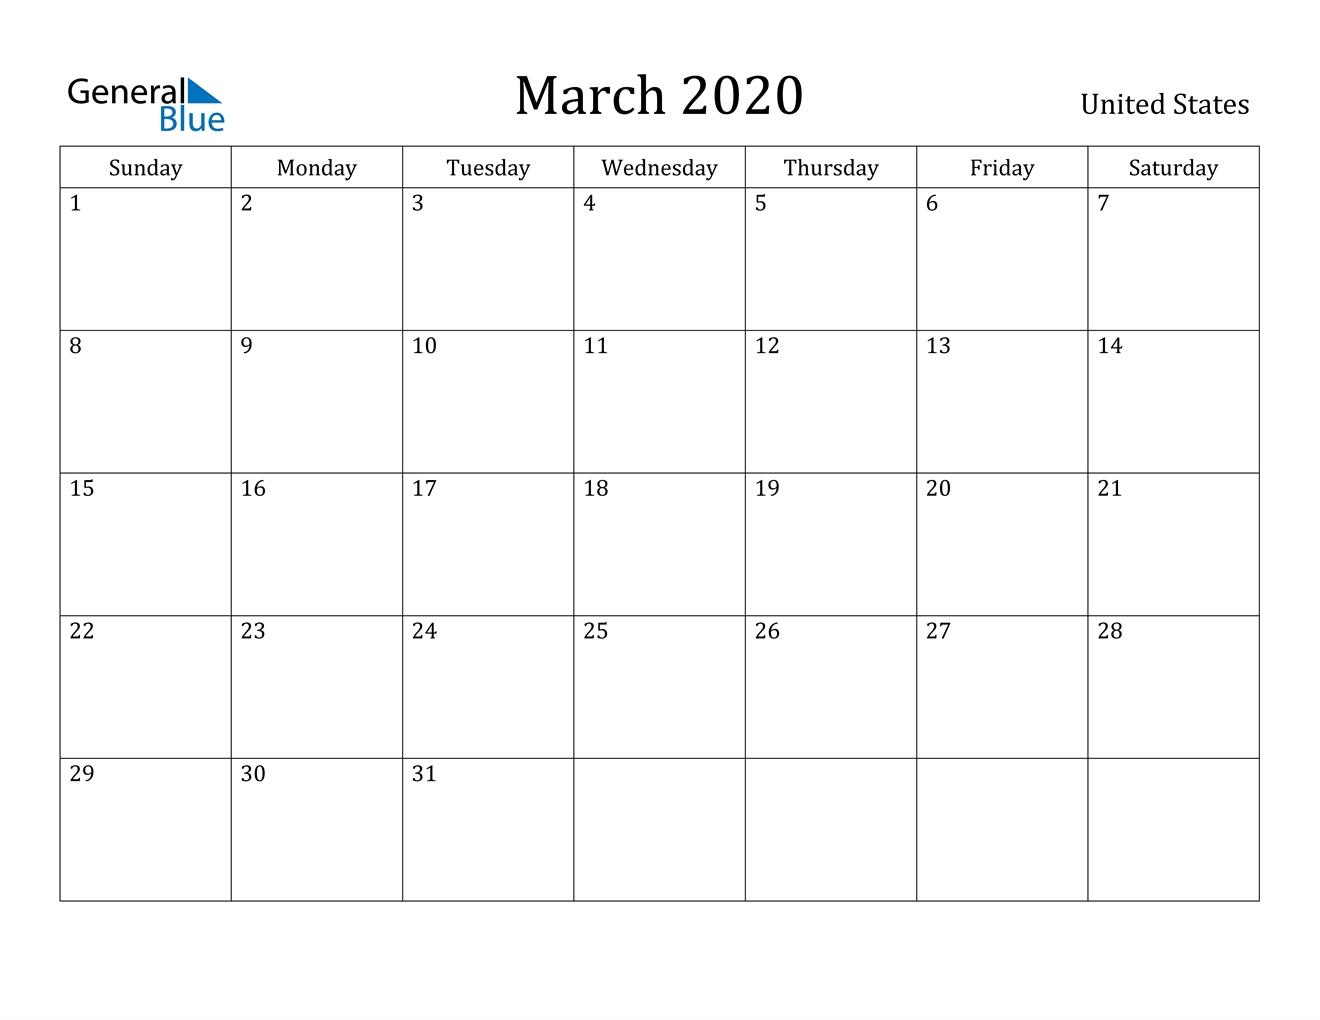 March 2020 Calendar - United States